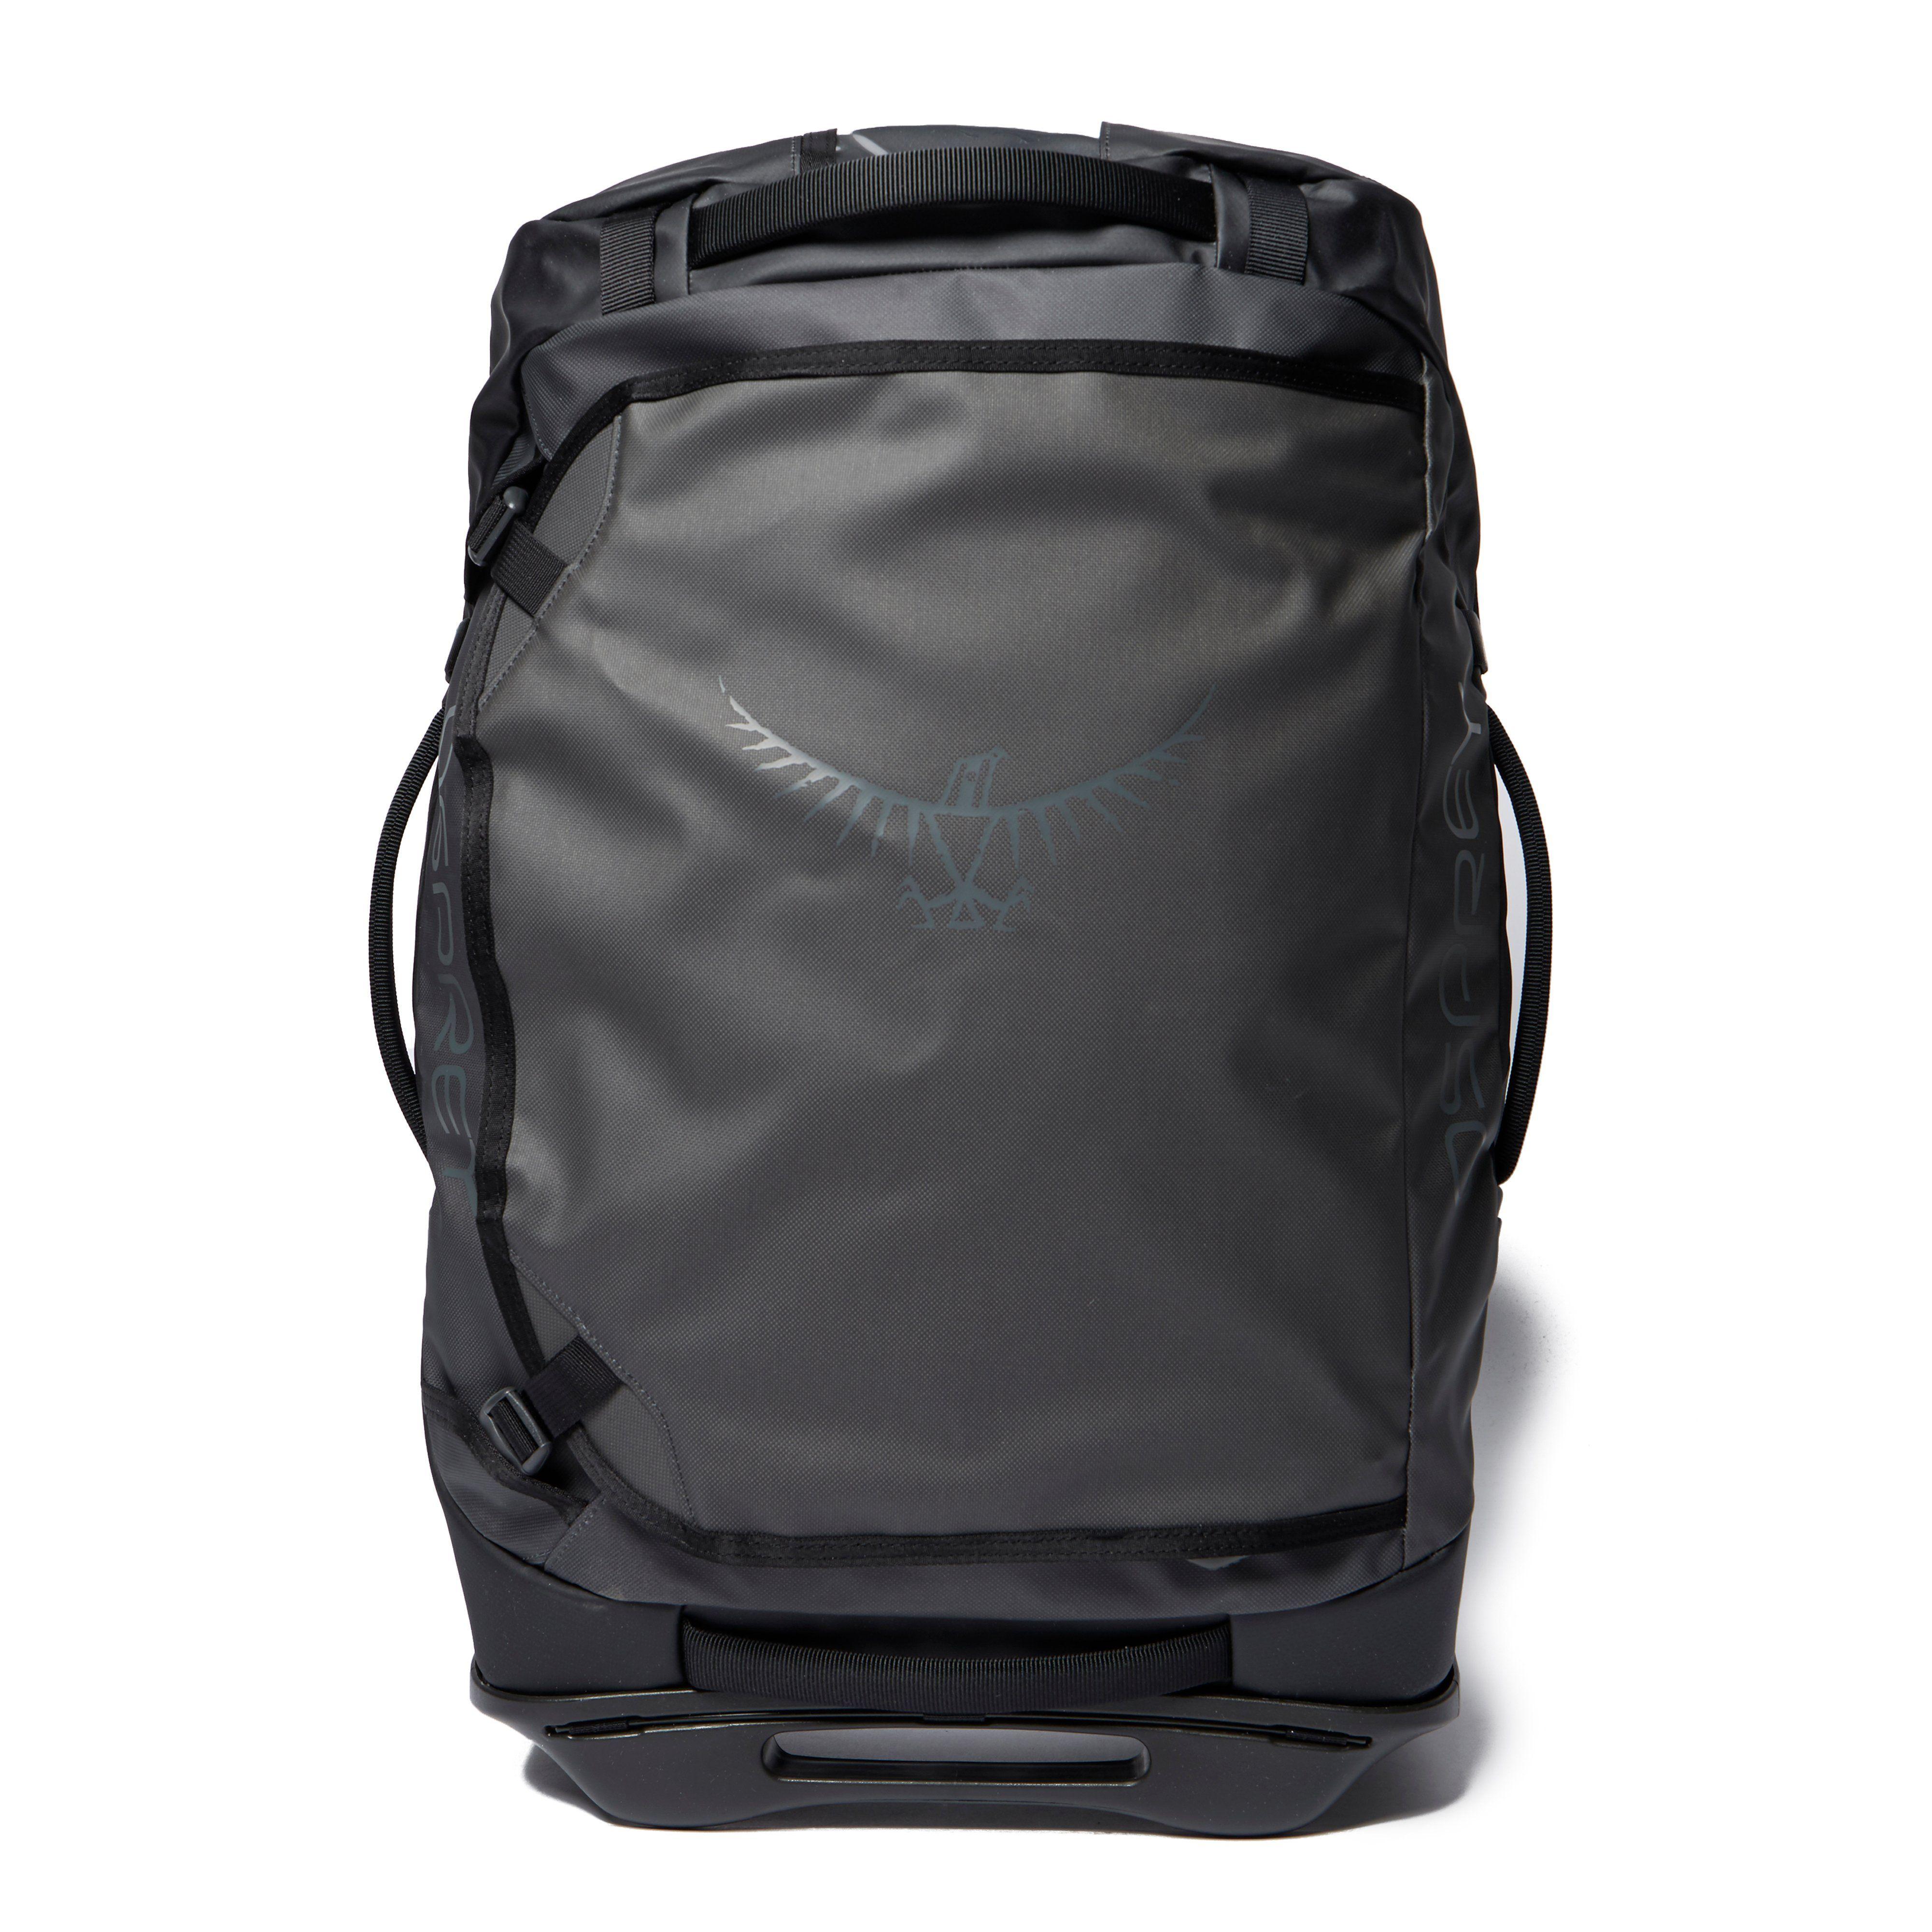 Osprey Rolling Transporter 40L Wheeled Duffel Bag